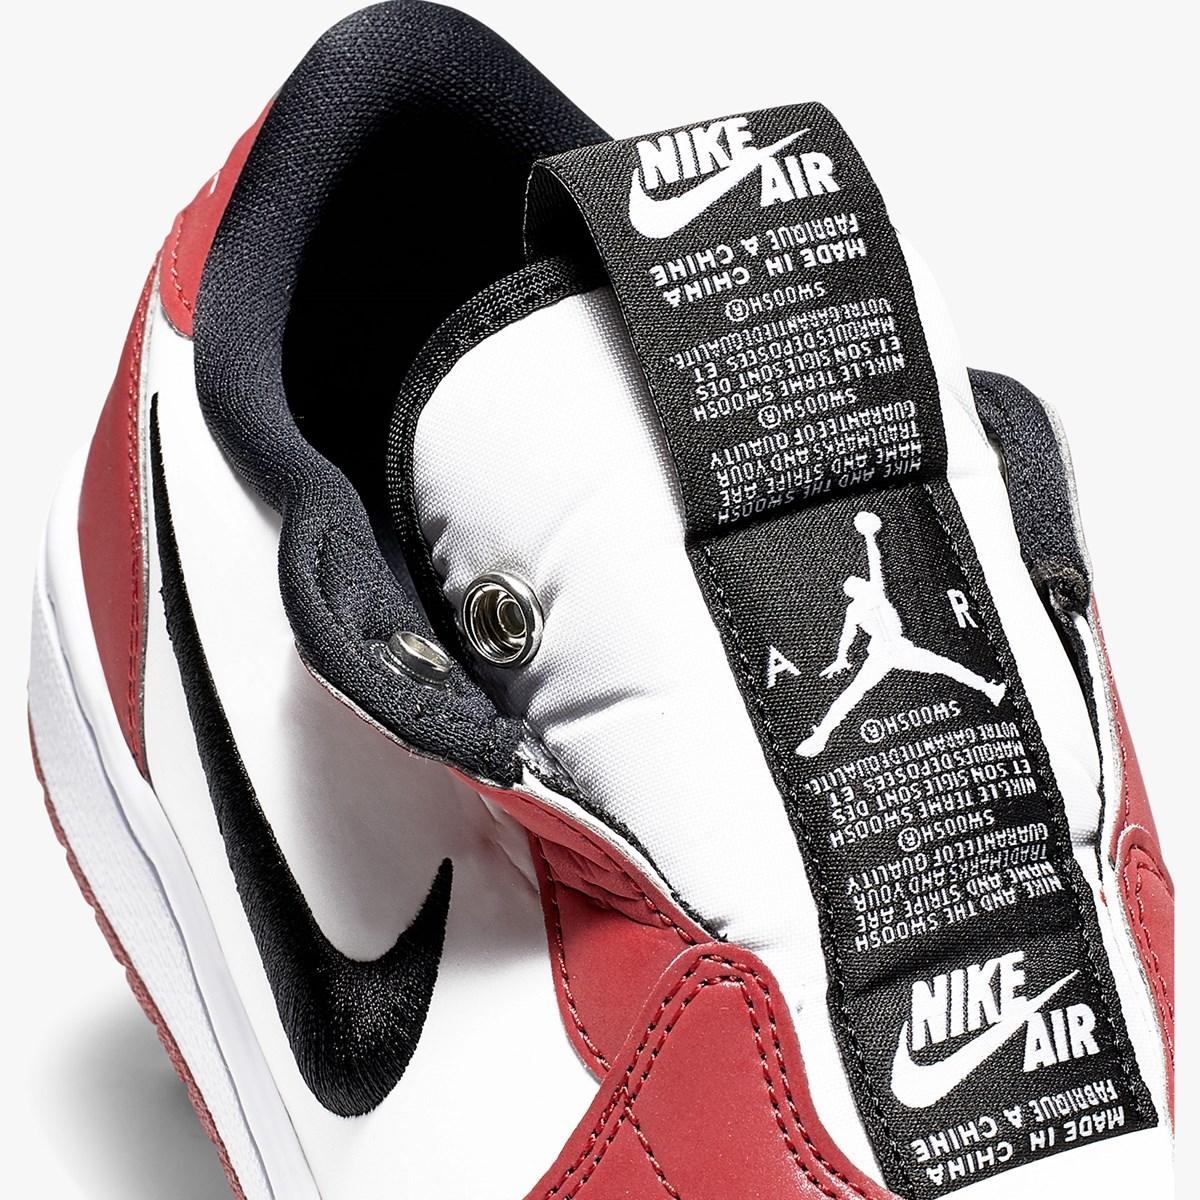 e108c56a9 Jordan Brand Wmns Air Jordan 1 Low Slip - Bq8462-601 - Sneakersnstuff